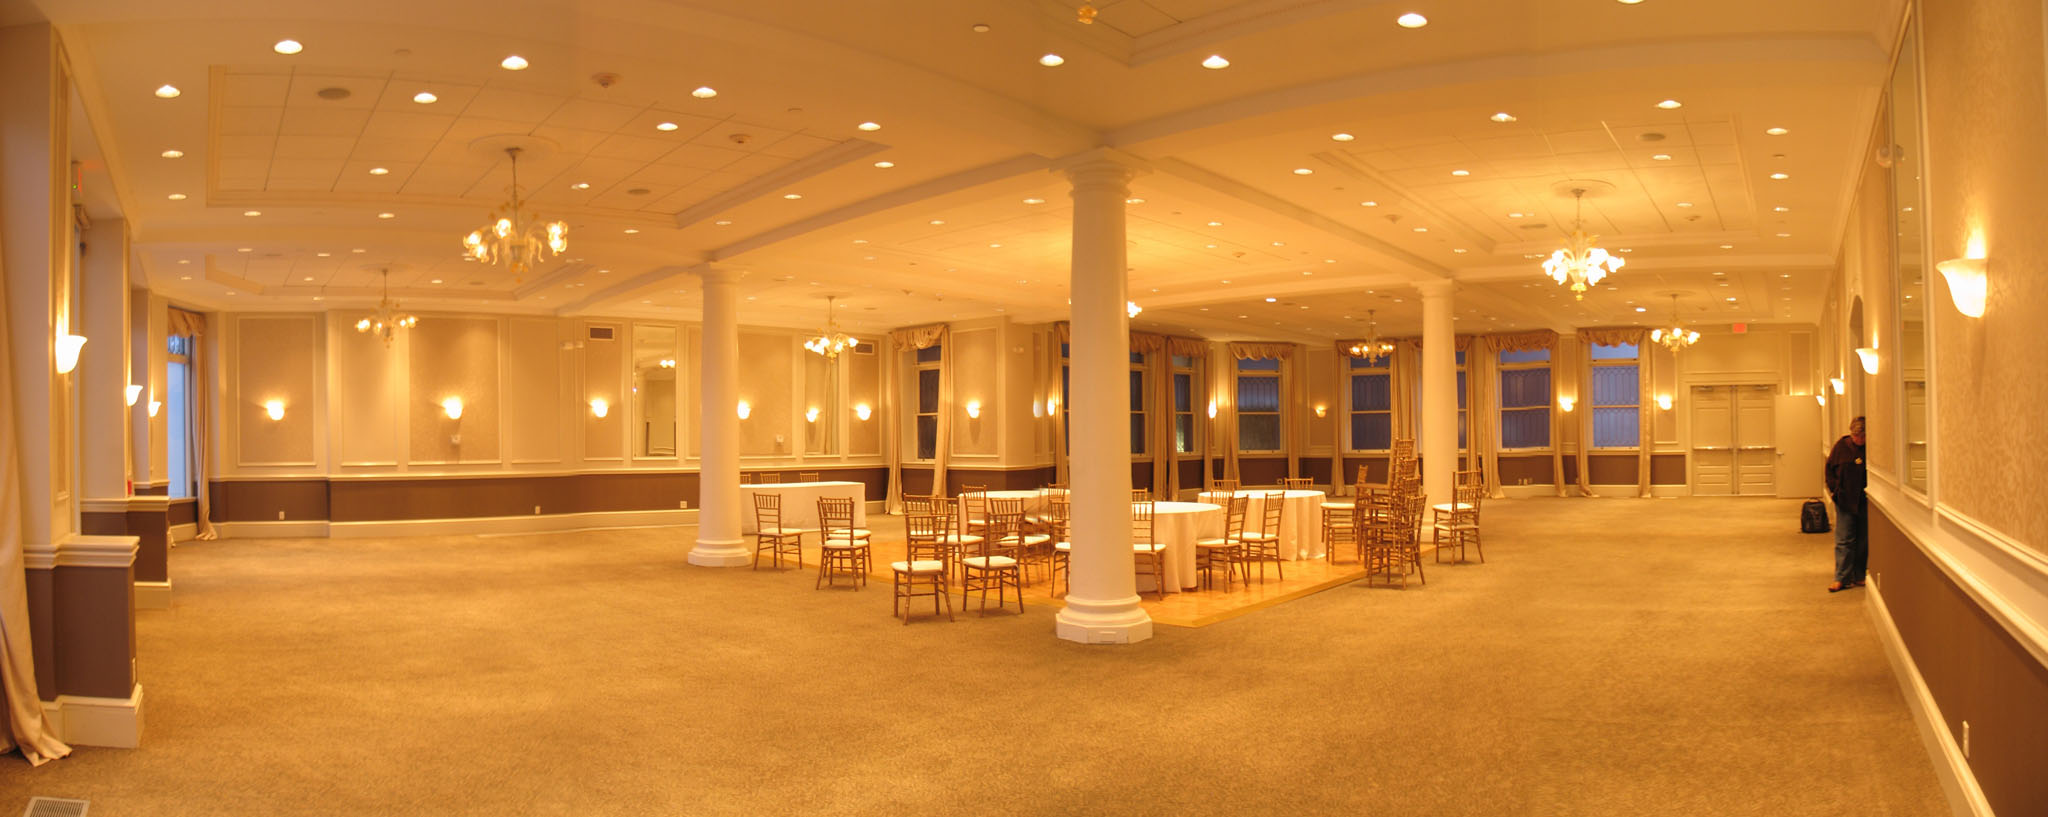 Location Photos of Crocker House Ballroom